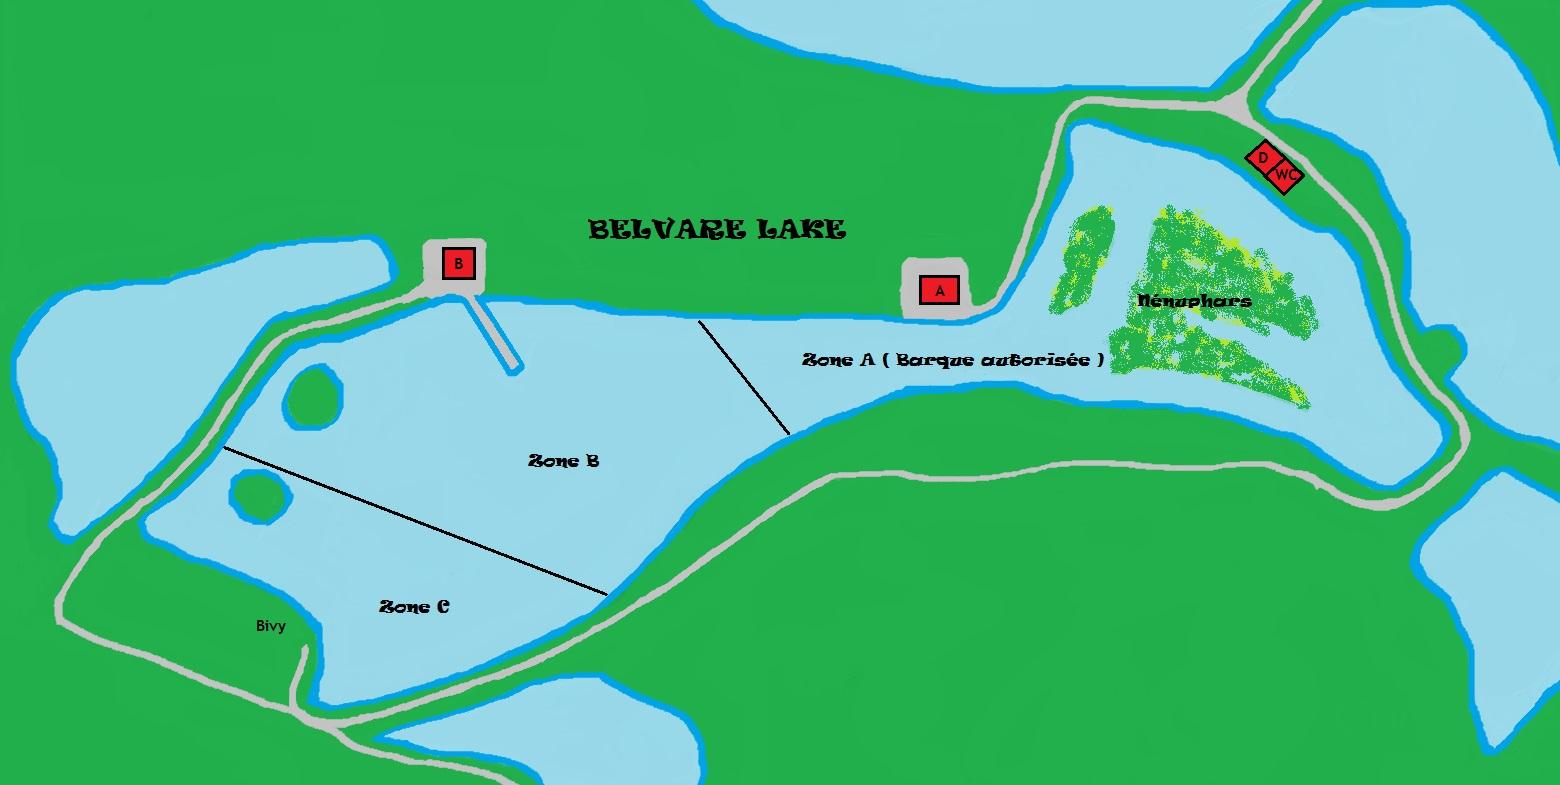 Belvare: Zone B, 6 p. Chalet prijs incl 1 visser